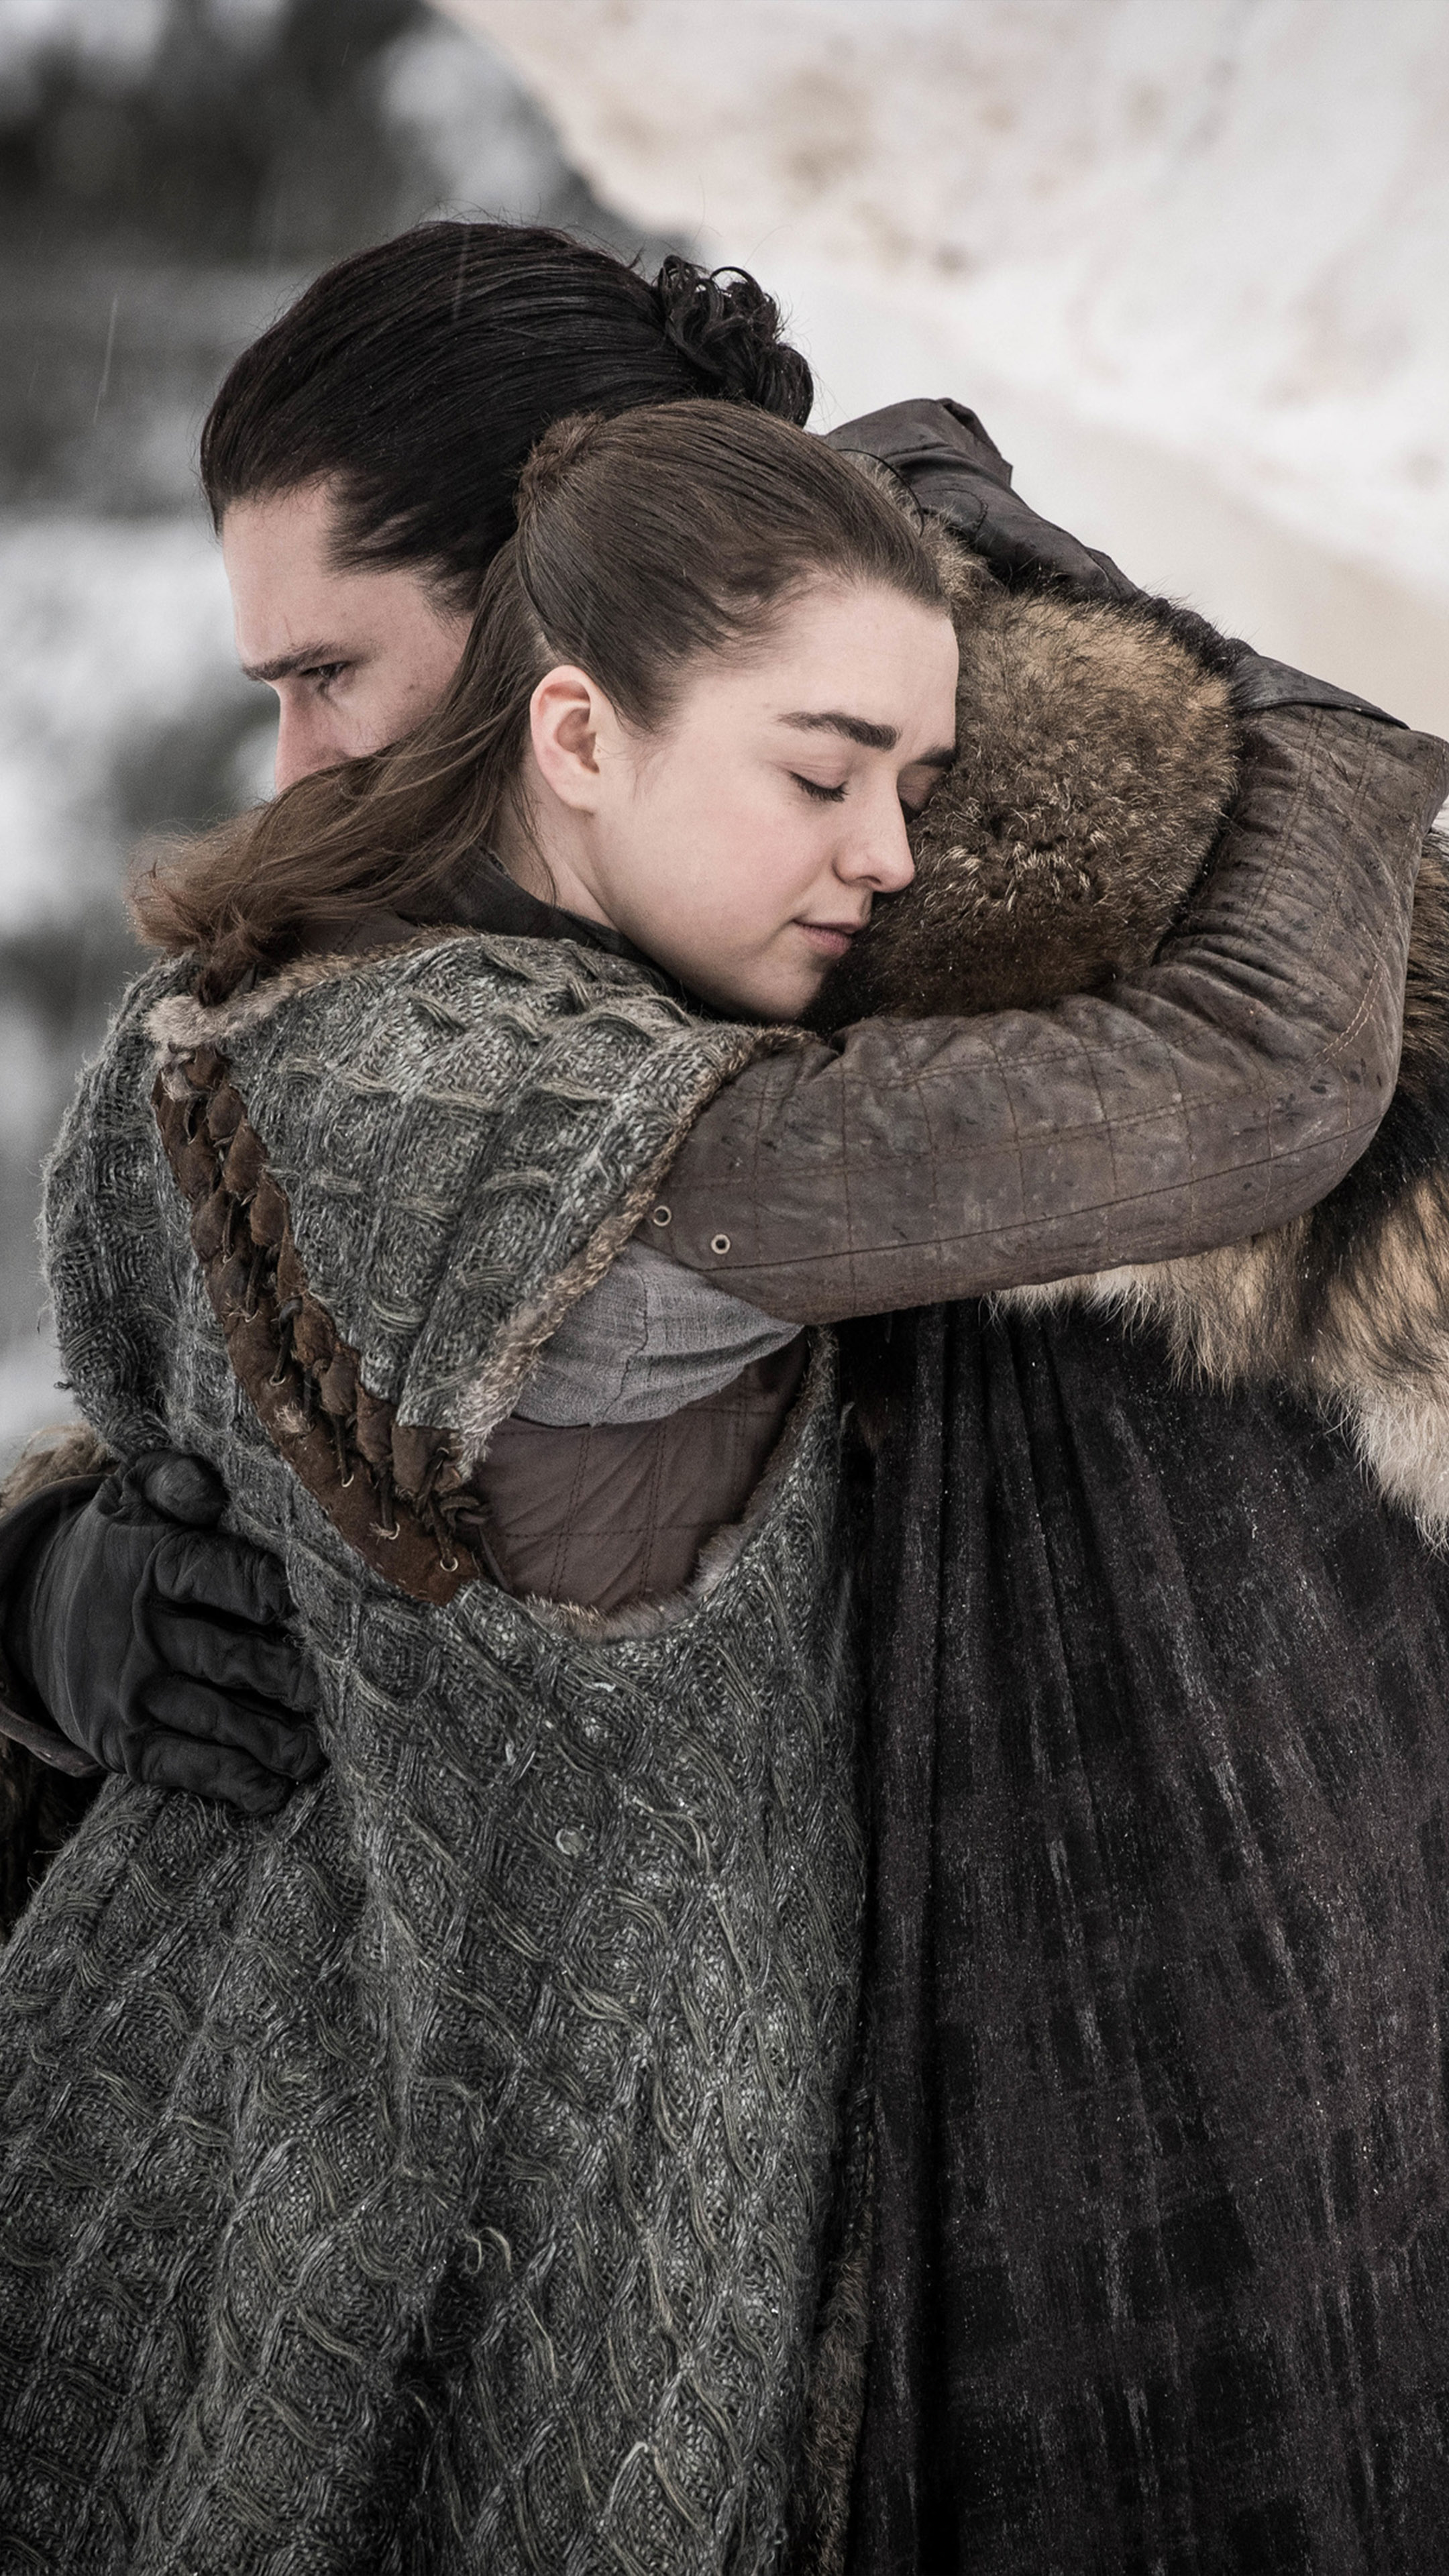 Jon Snow Arya Stark In Game Of Thrones S8 Free 4k Ultra Hd